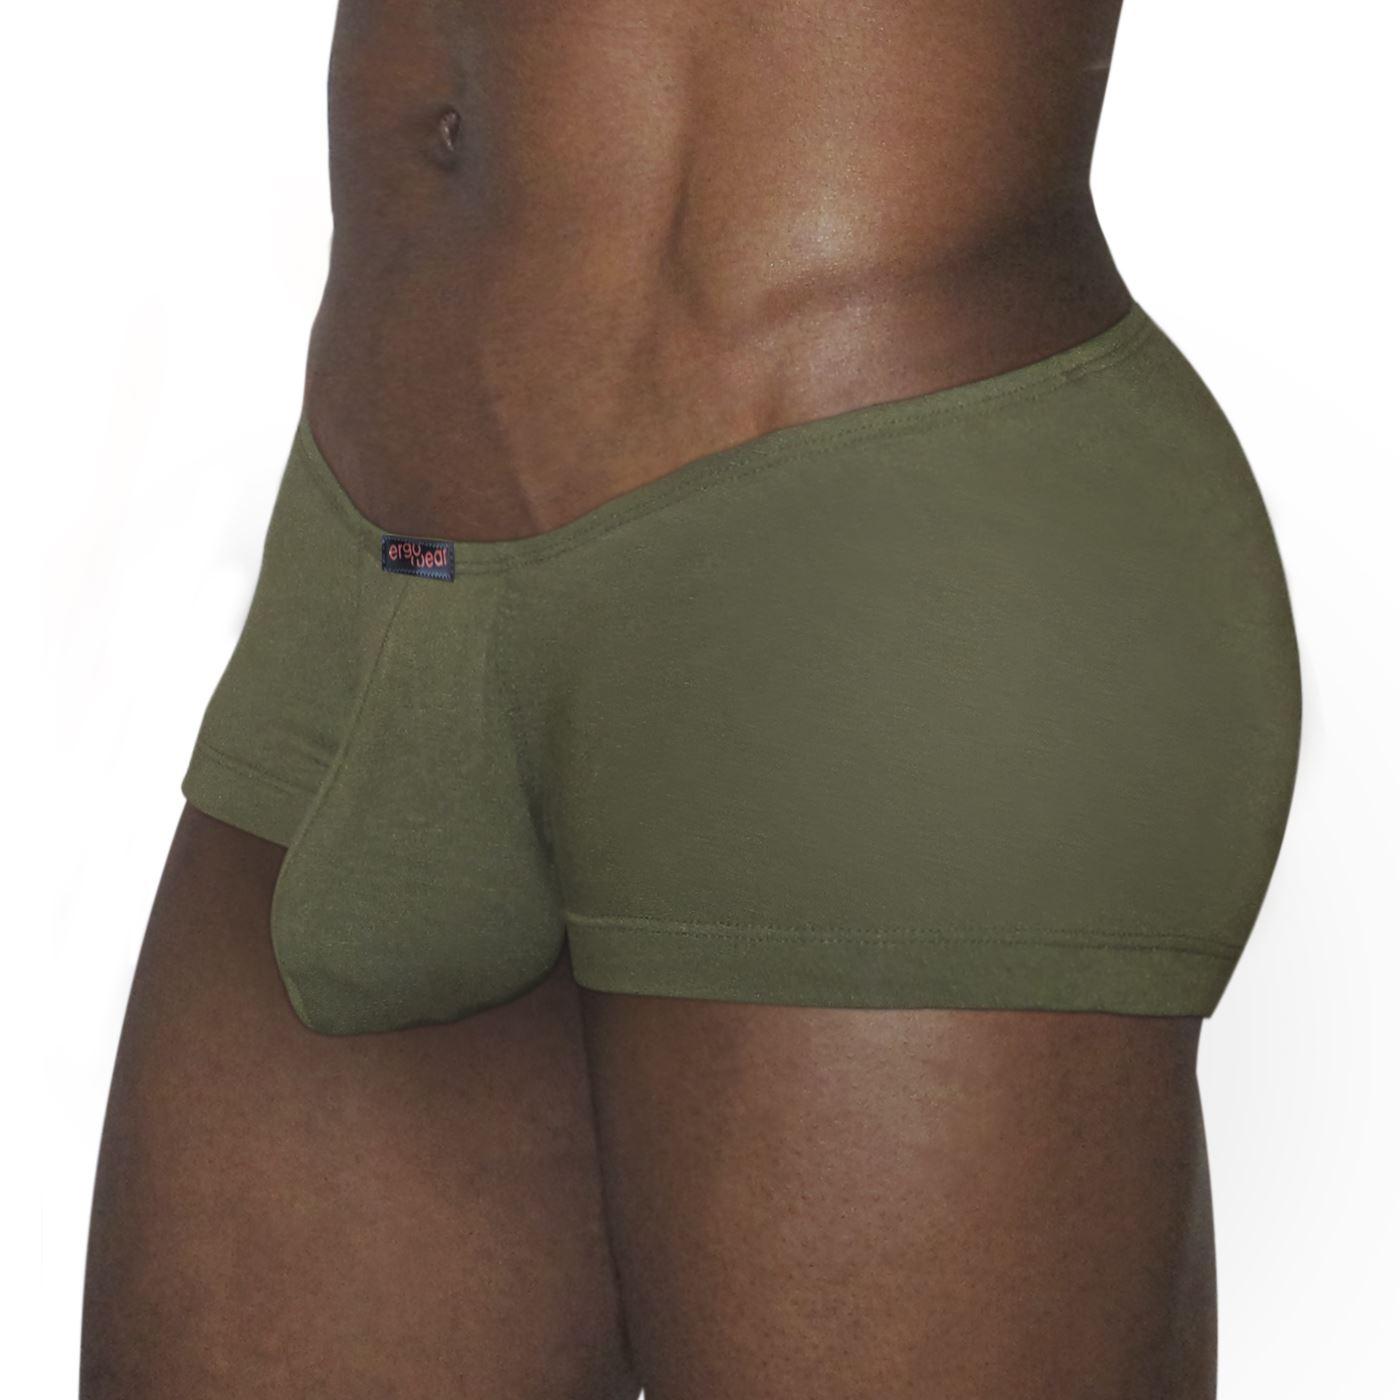 Ergowear-X3D-Modal-Mini-Boxer-men-039-s-underwear-enhance-short-low-rise-trunk-brief miniatuur 6